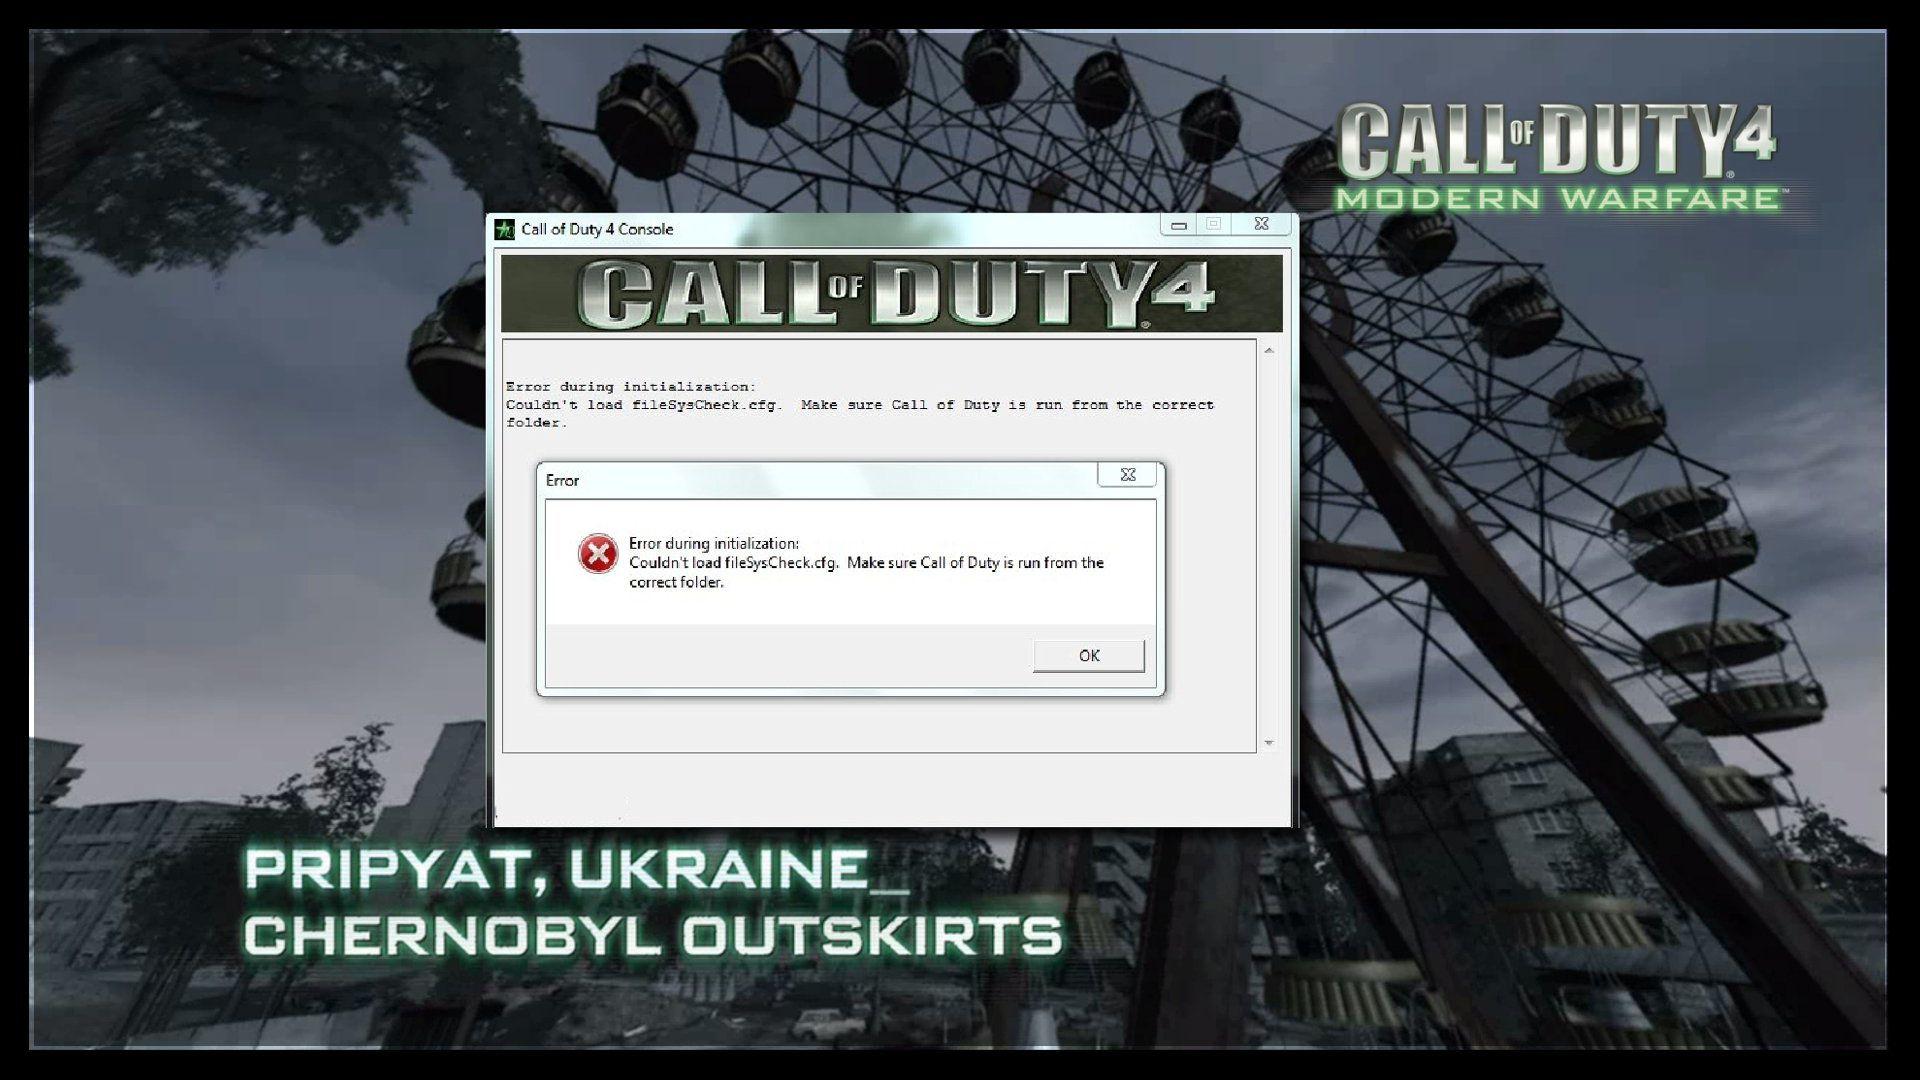 Call of Duty 4 Modern Warfare FilesSysCheck.cfg Error